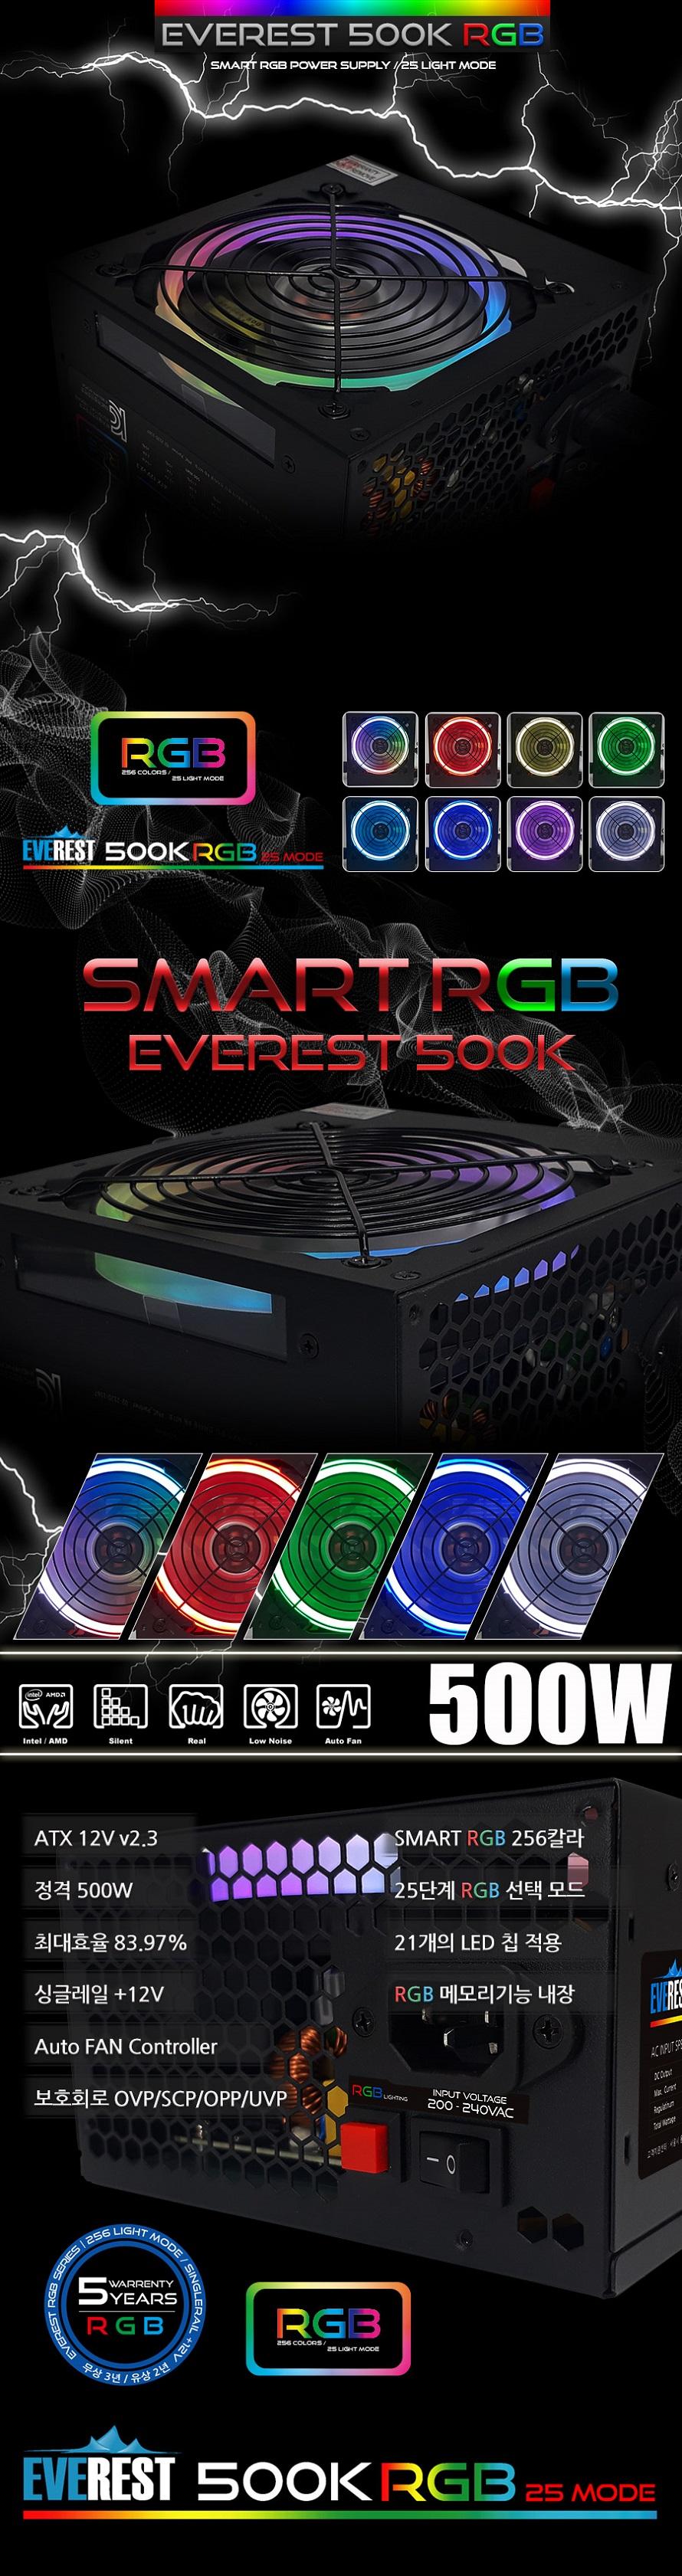 PNC PARTNER  EVEREST 500K RGB 벌크